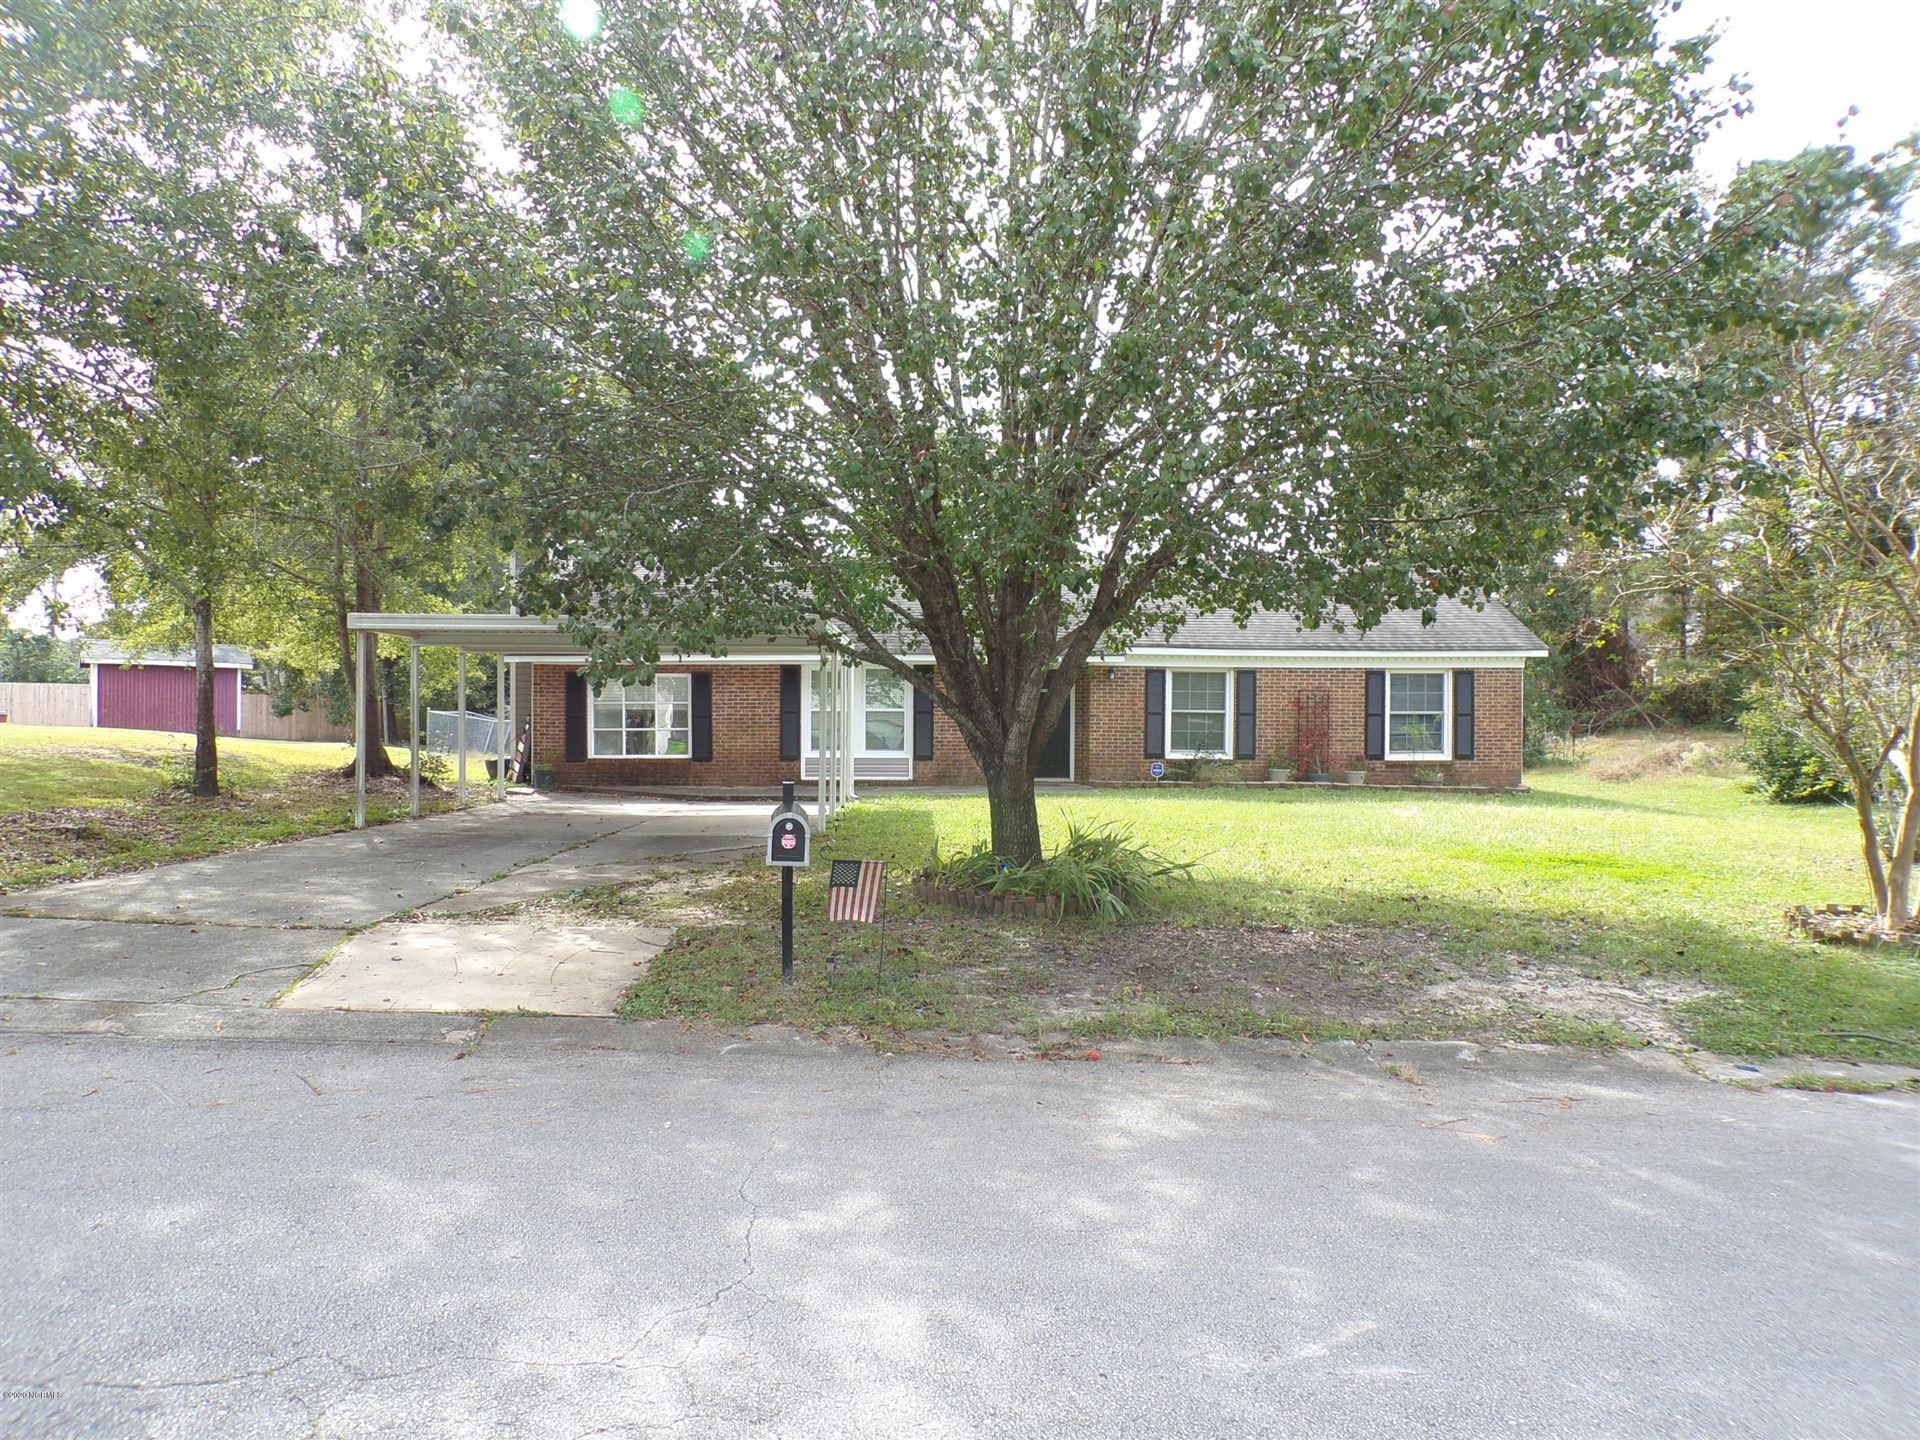 Photo of 103 Windsor Court, Jacksonville, NC 28546 (MLS # 100292101)